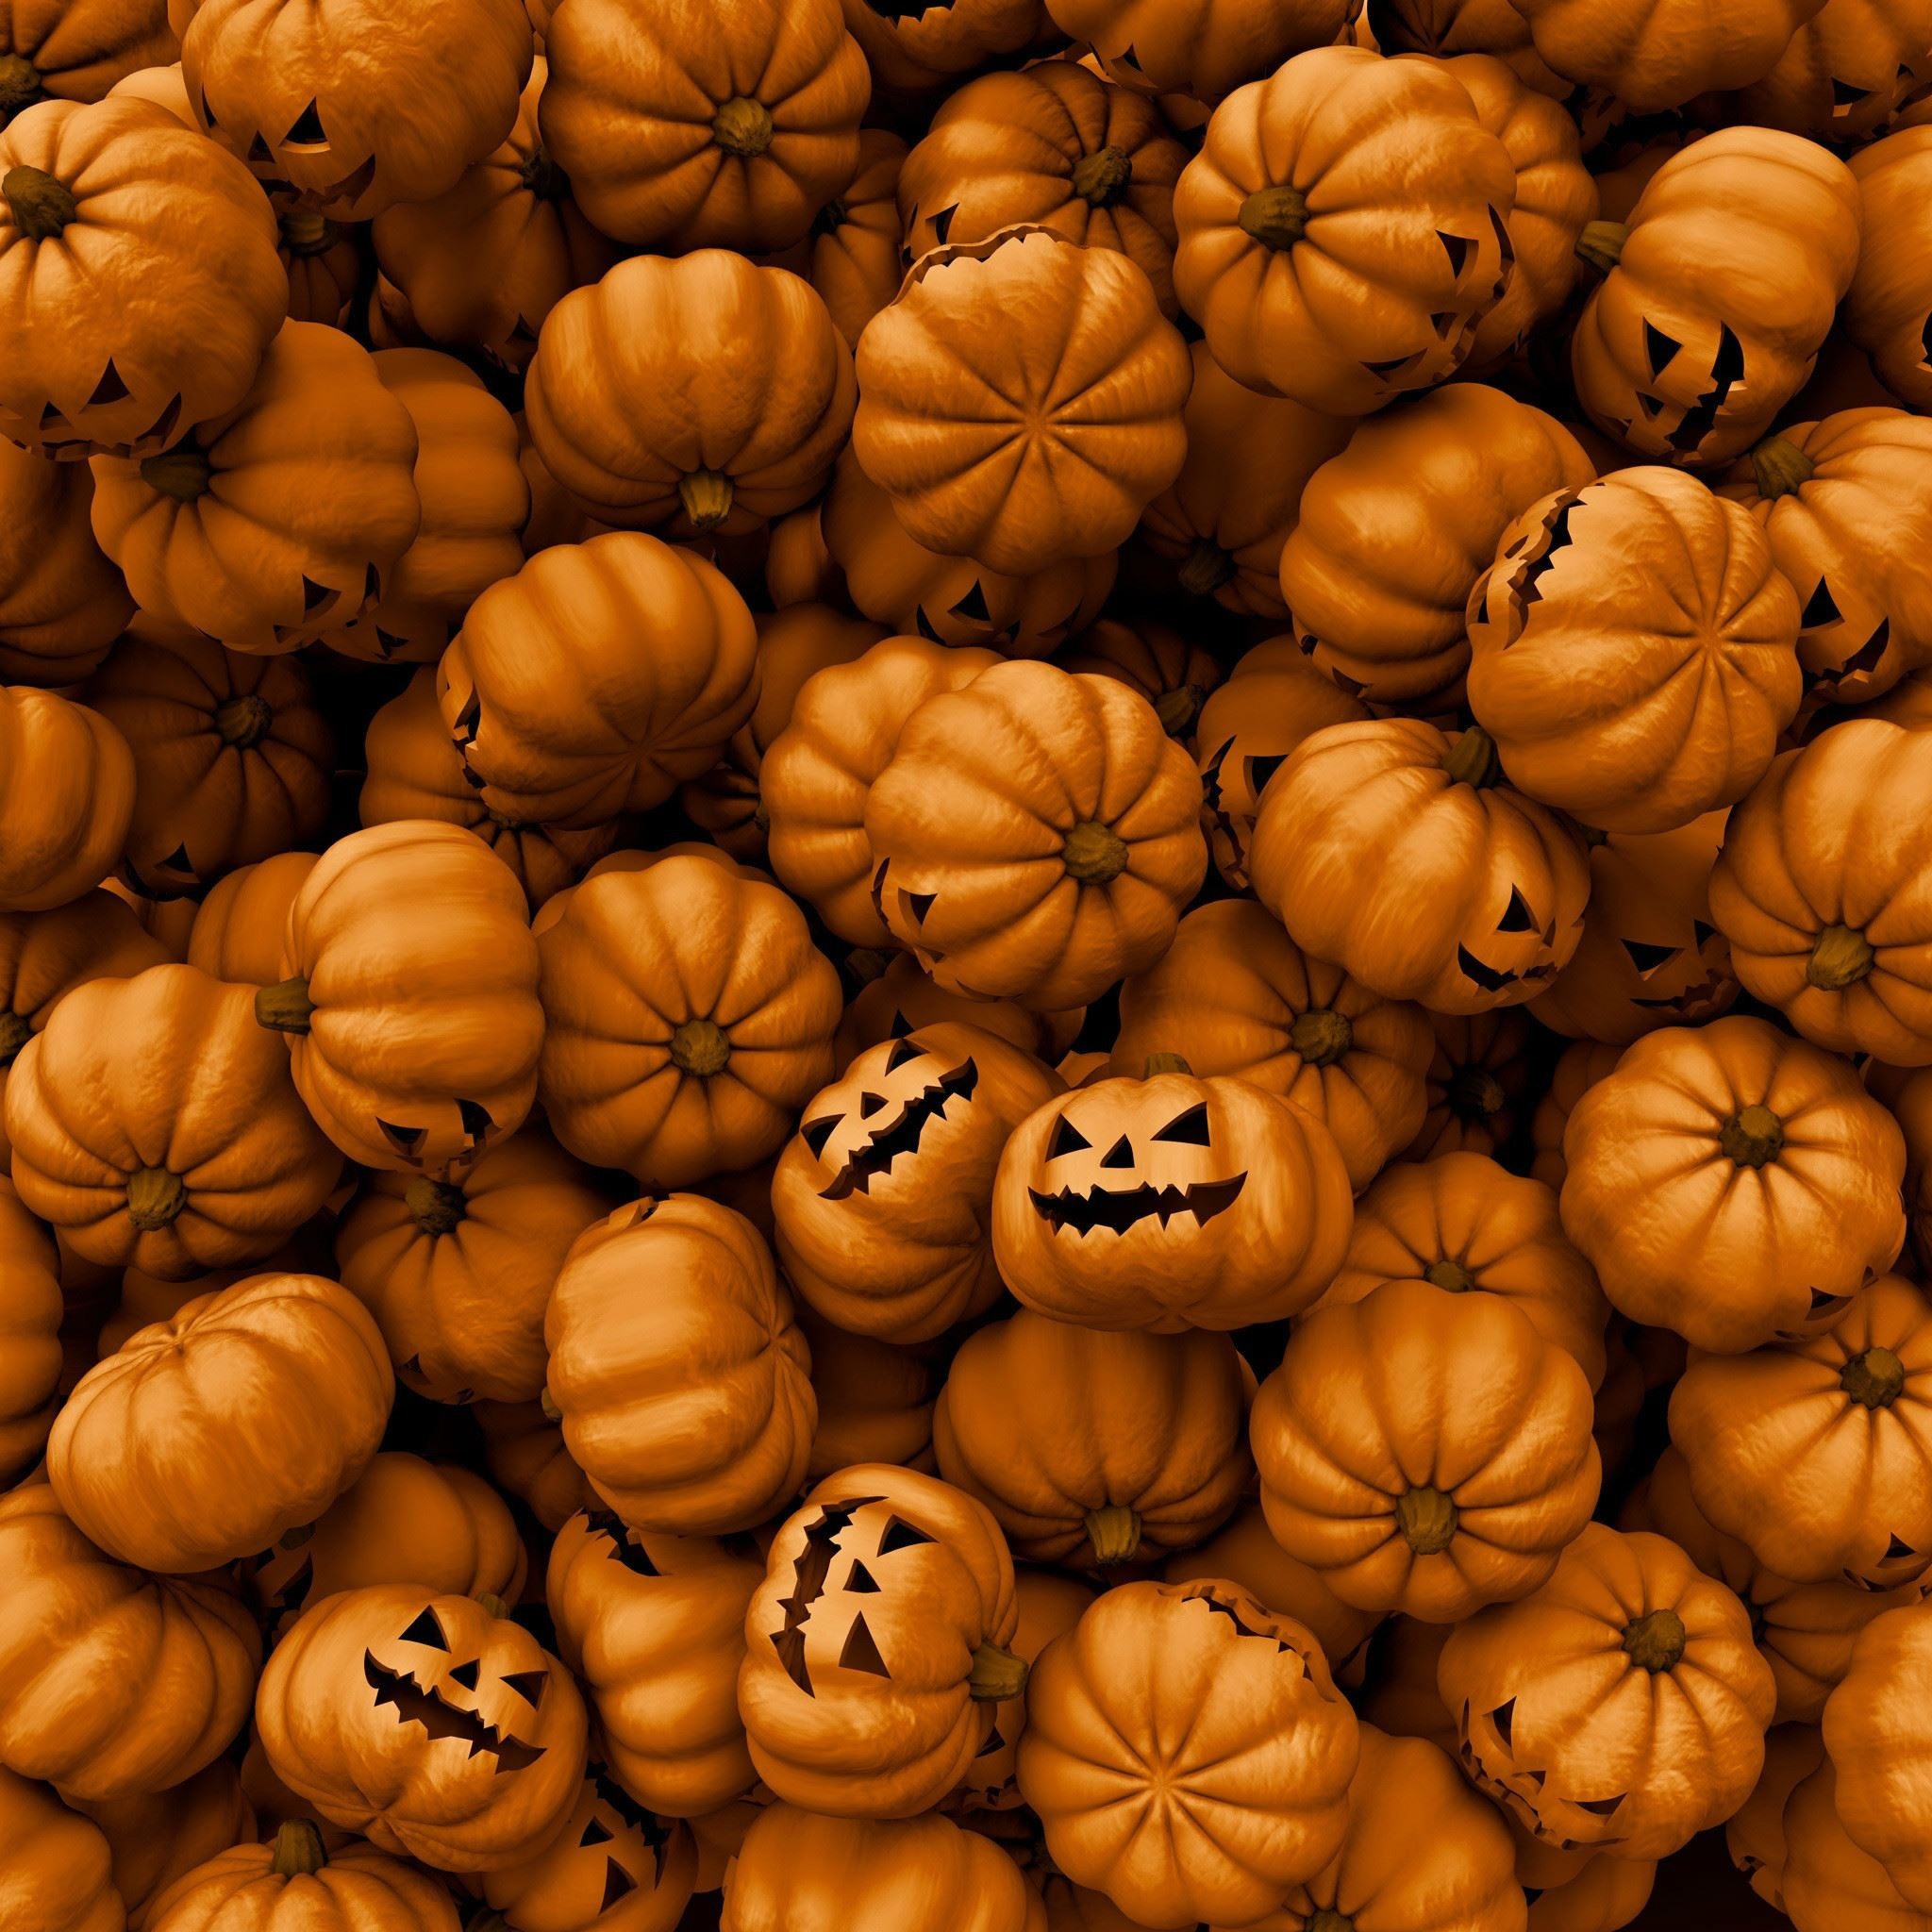 Halloween Pumpkins Ipad Air Wallpapers Free Download